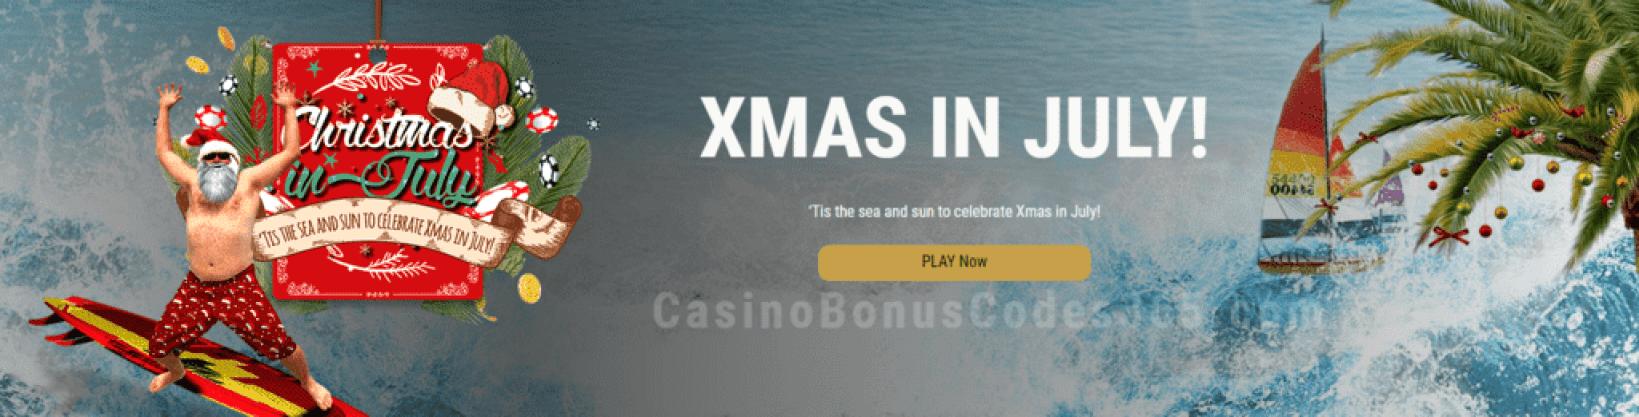 Grand Eagle Casino Xmas in July Special Promo